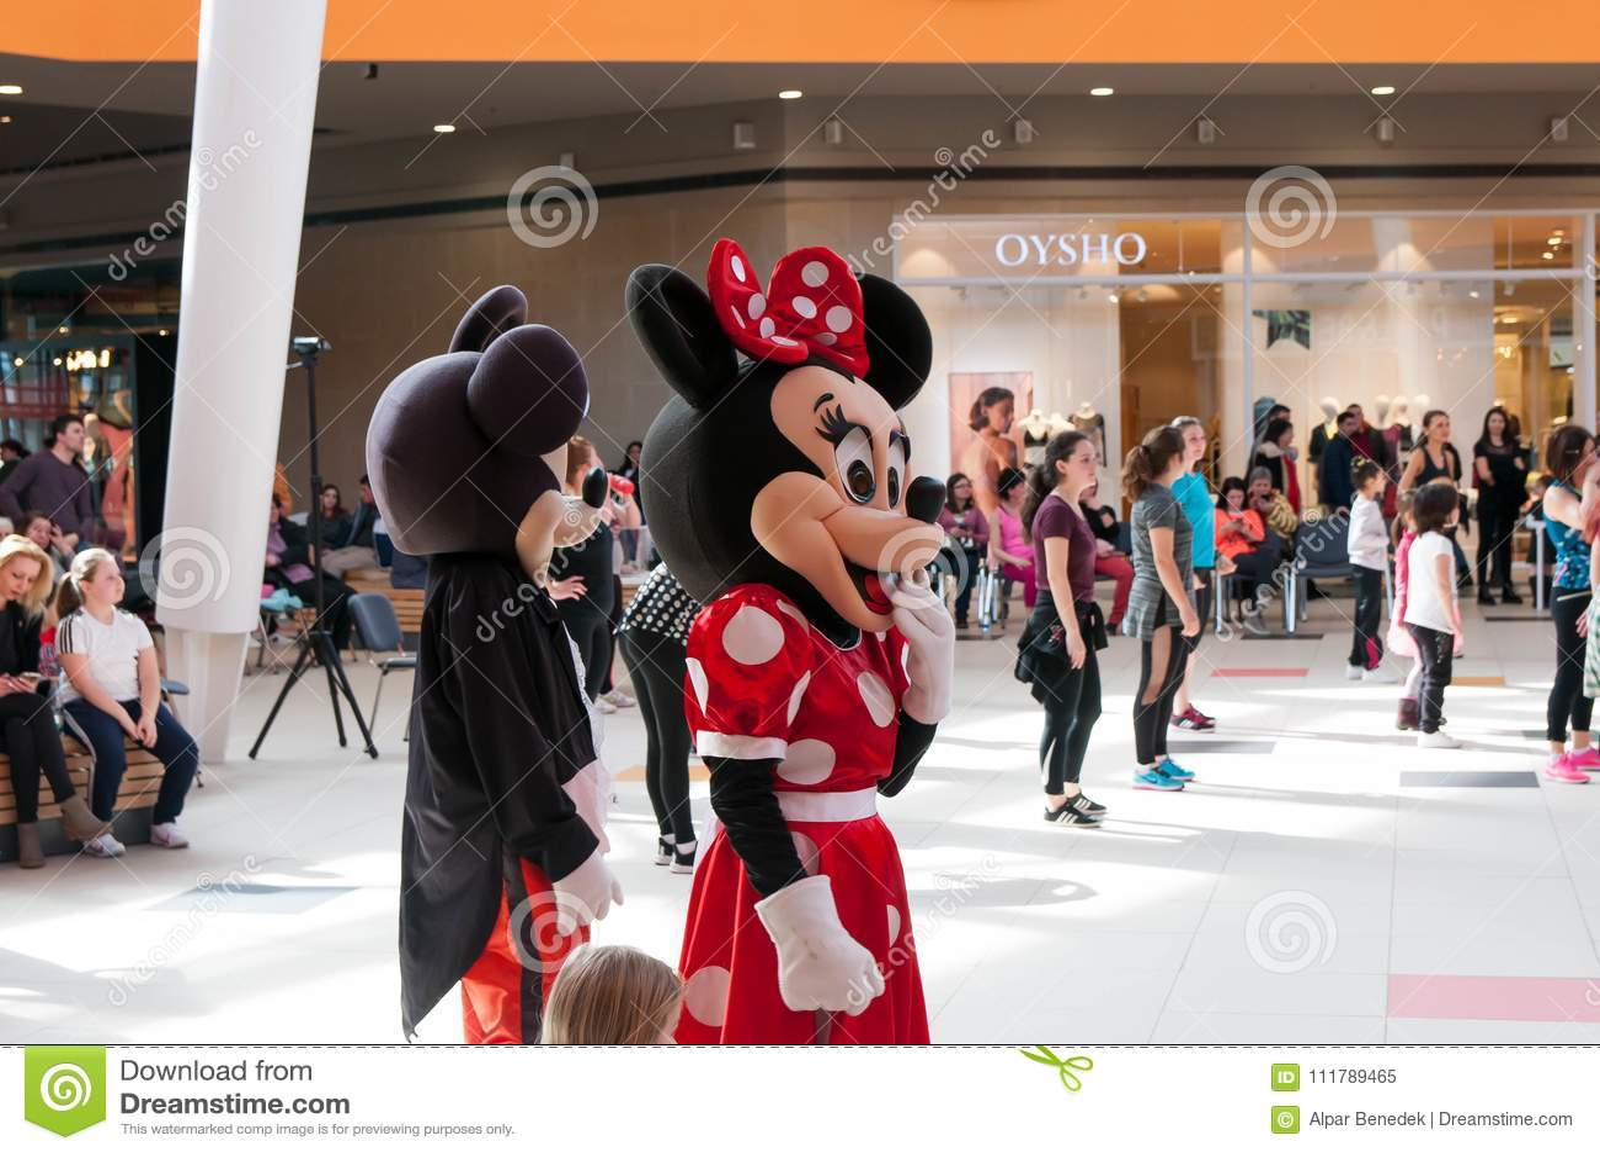 Mickey en Minnie-muisbeeldjes die omhoog de zumbadansers toejuichen